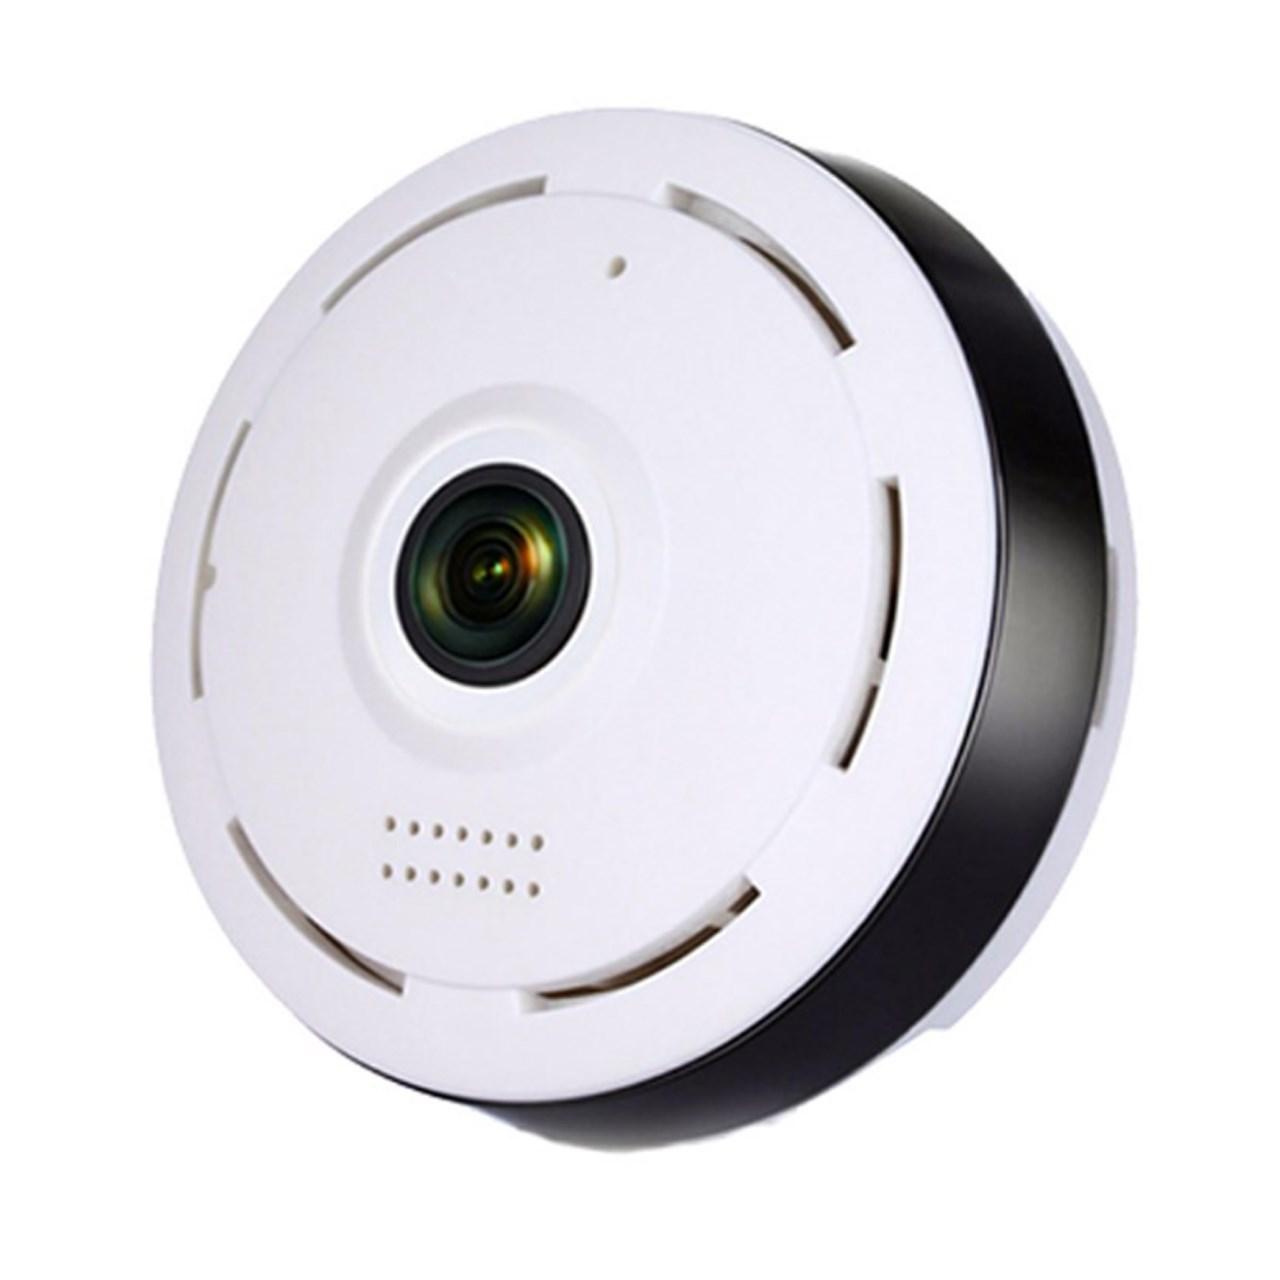 دوربین بی سیم تحت شبکه مدل V380S-Visonic